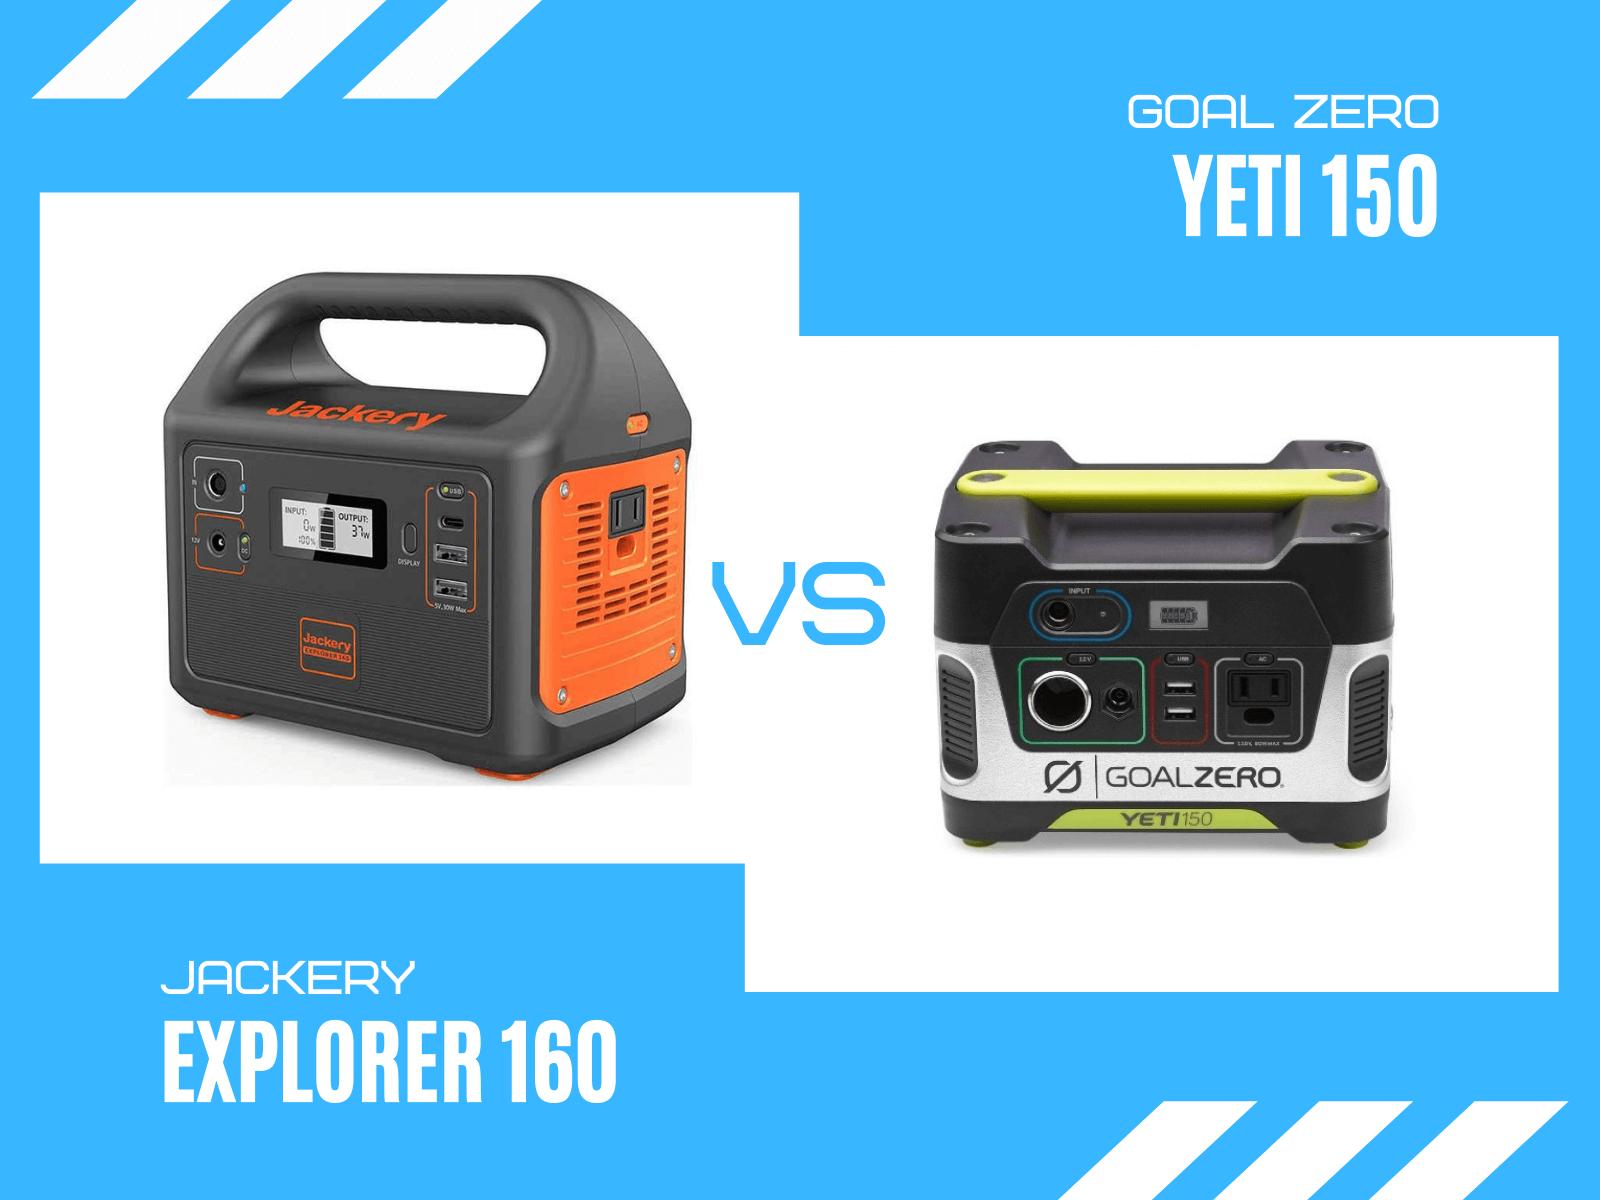 Review: Goal Zero Yeti 150 vs Jackery Explorer 160